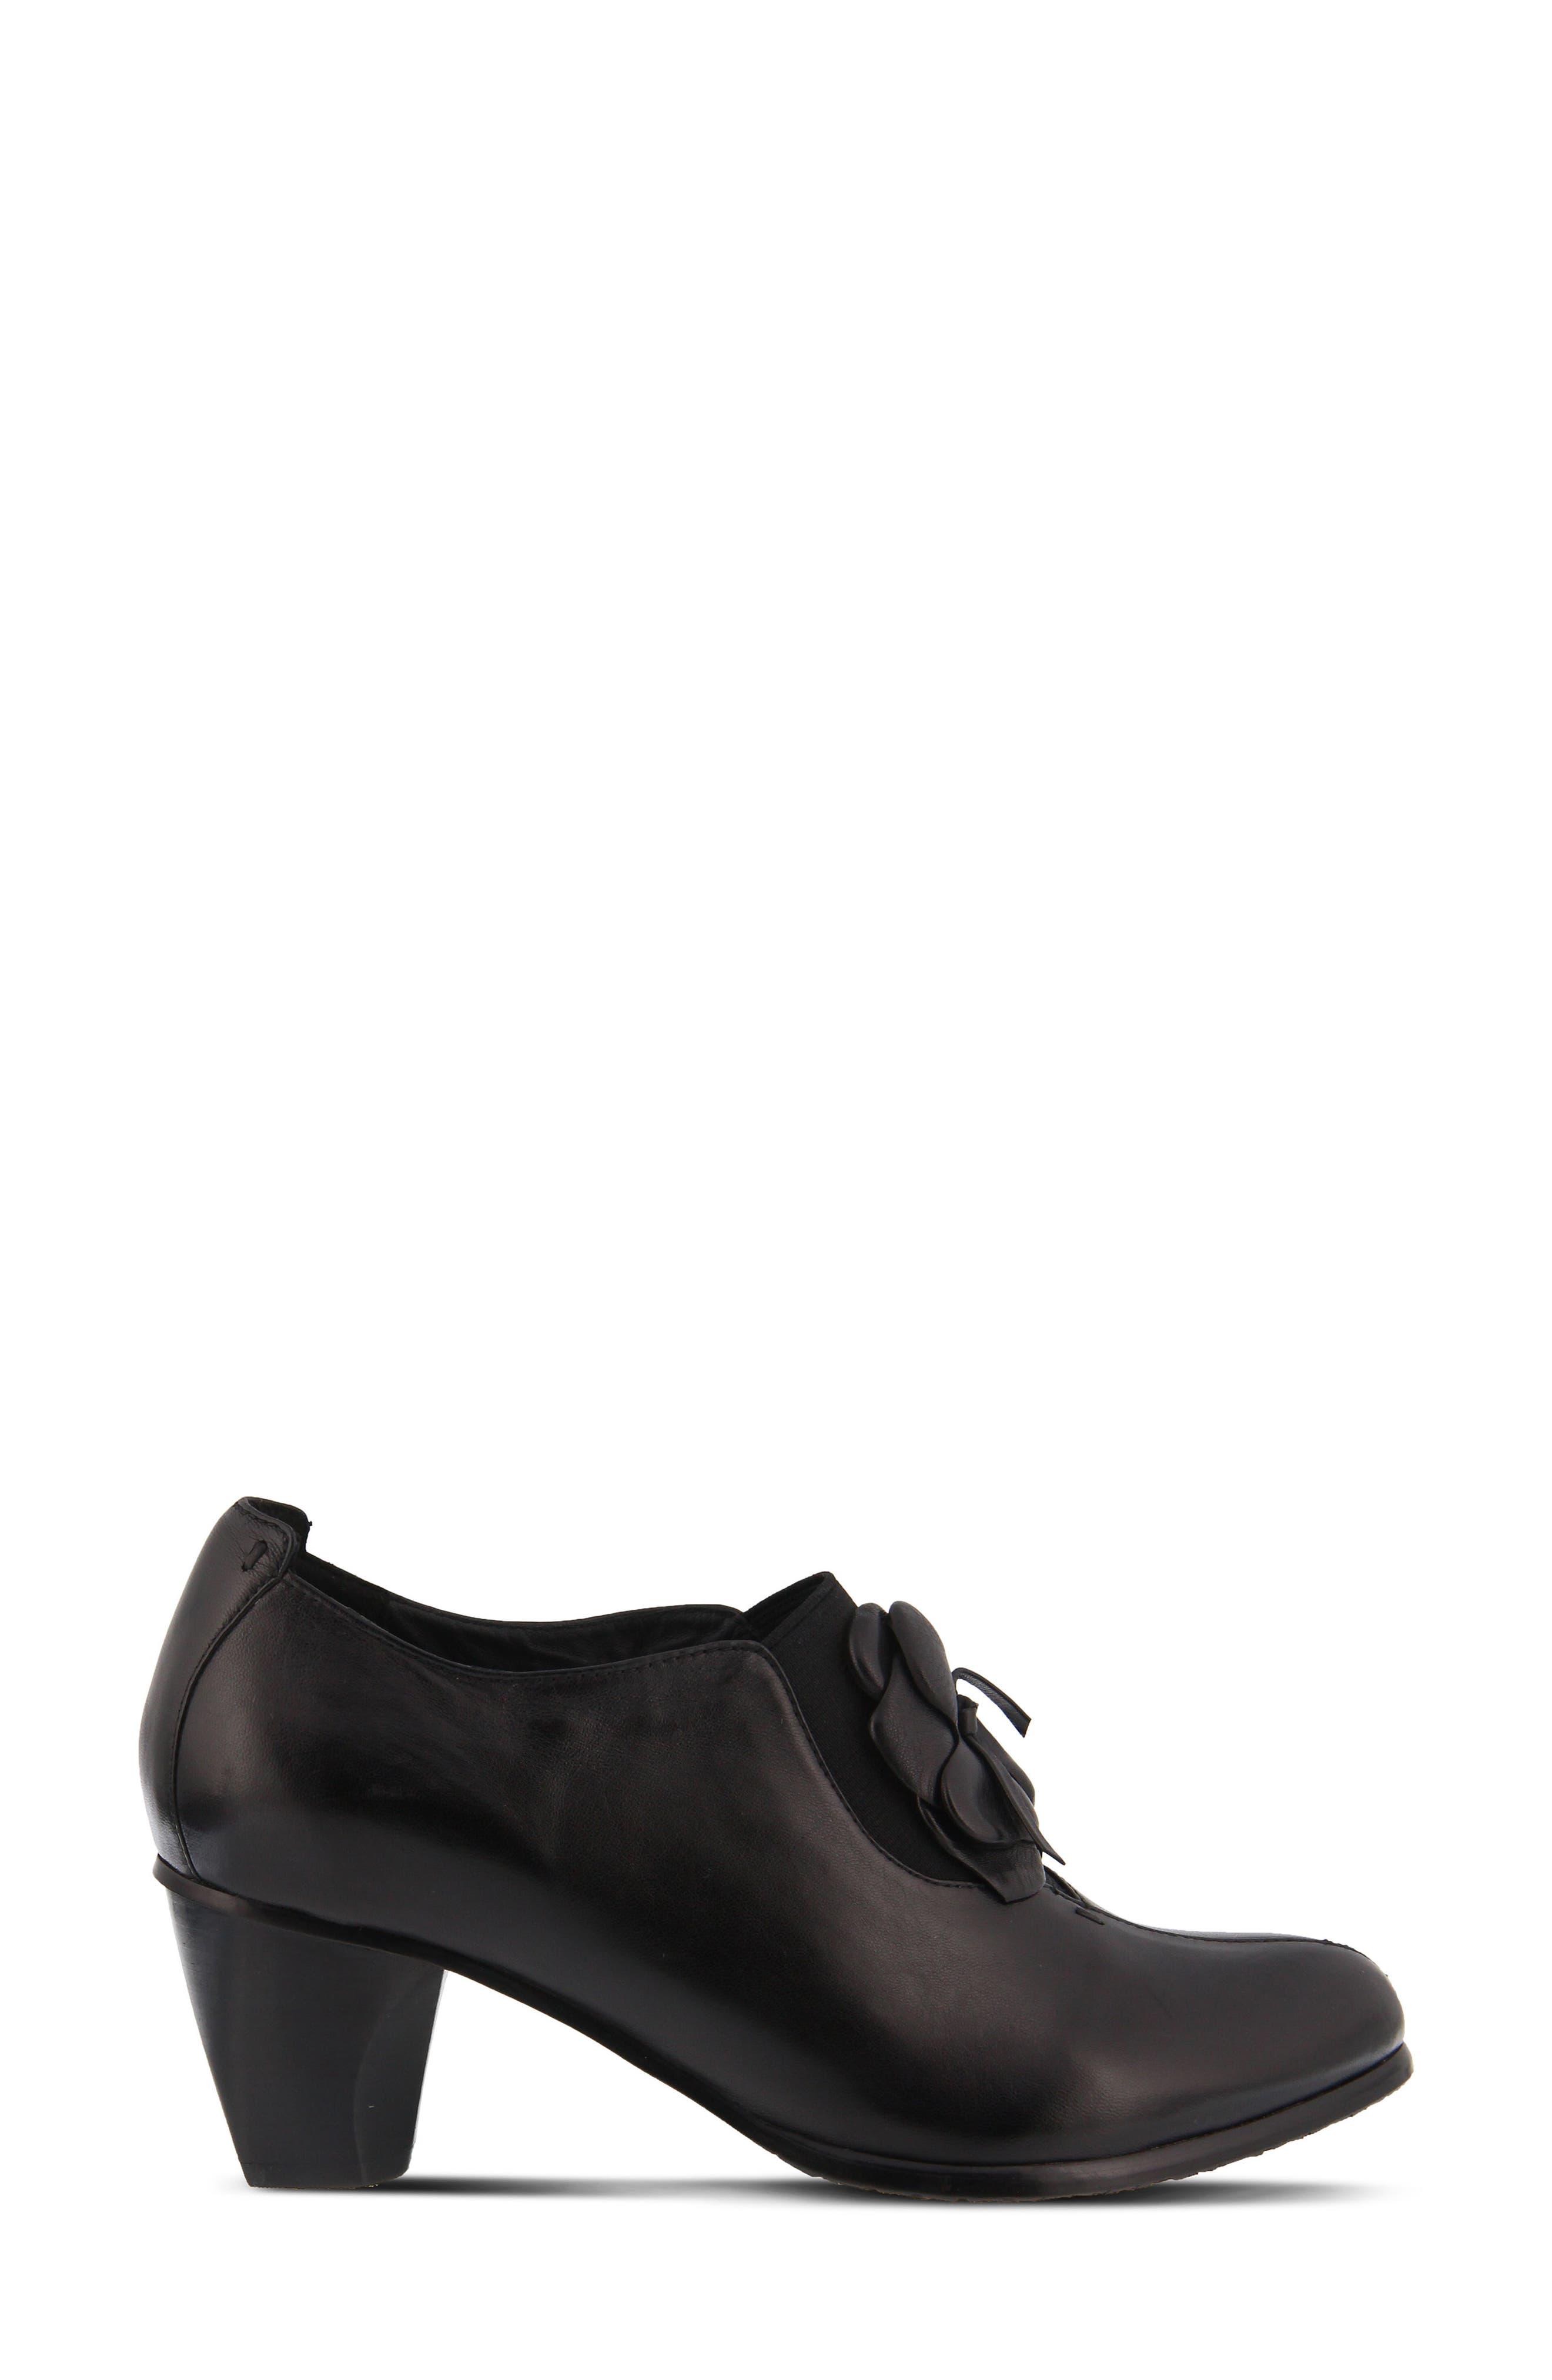 Evelina Pump,                             Alternate thumbnail 3, color,                             Black Leather